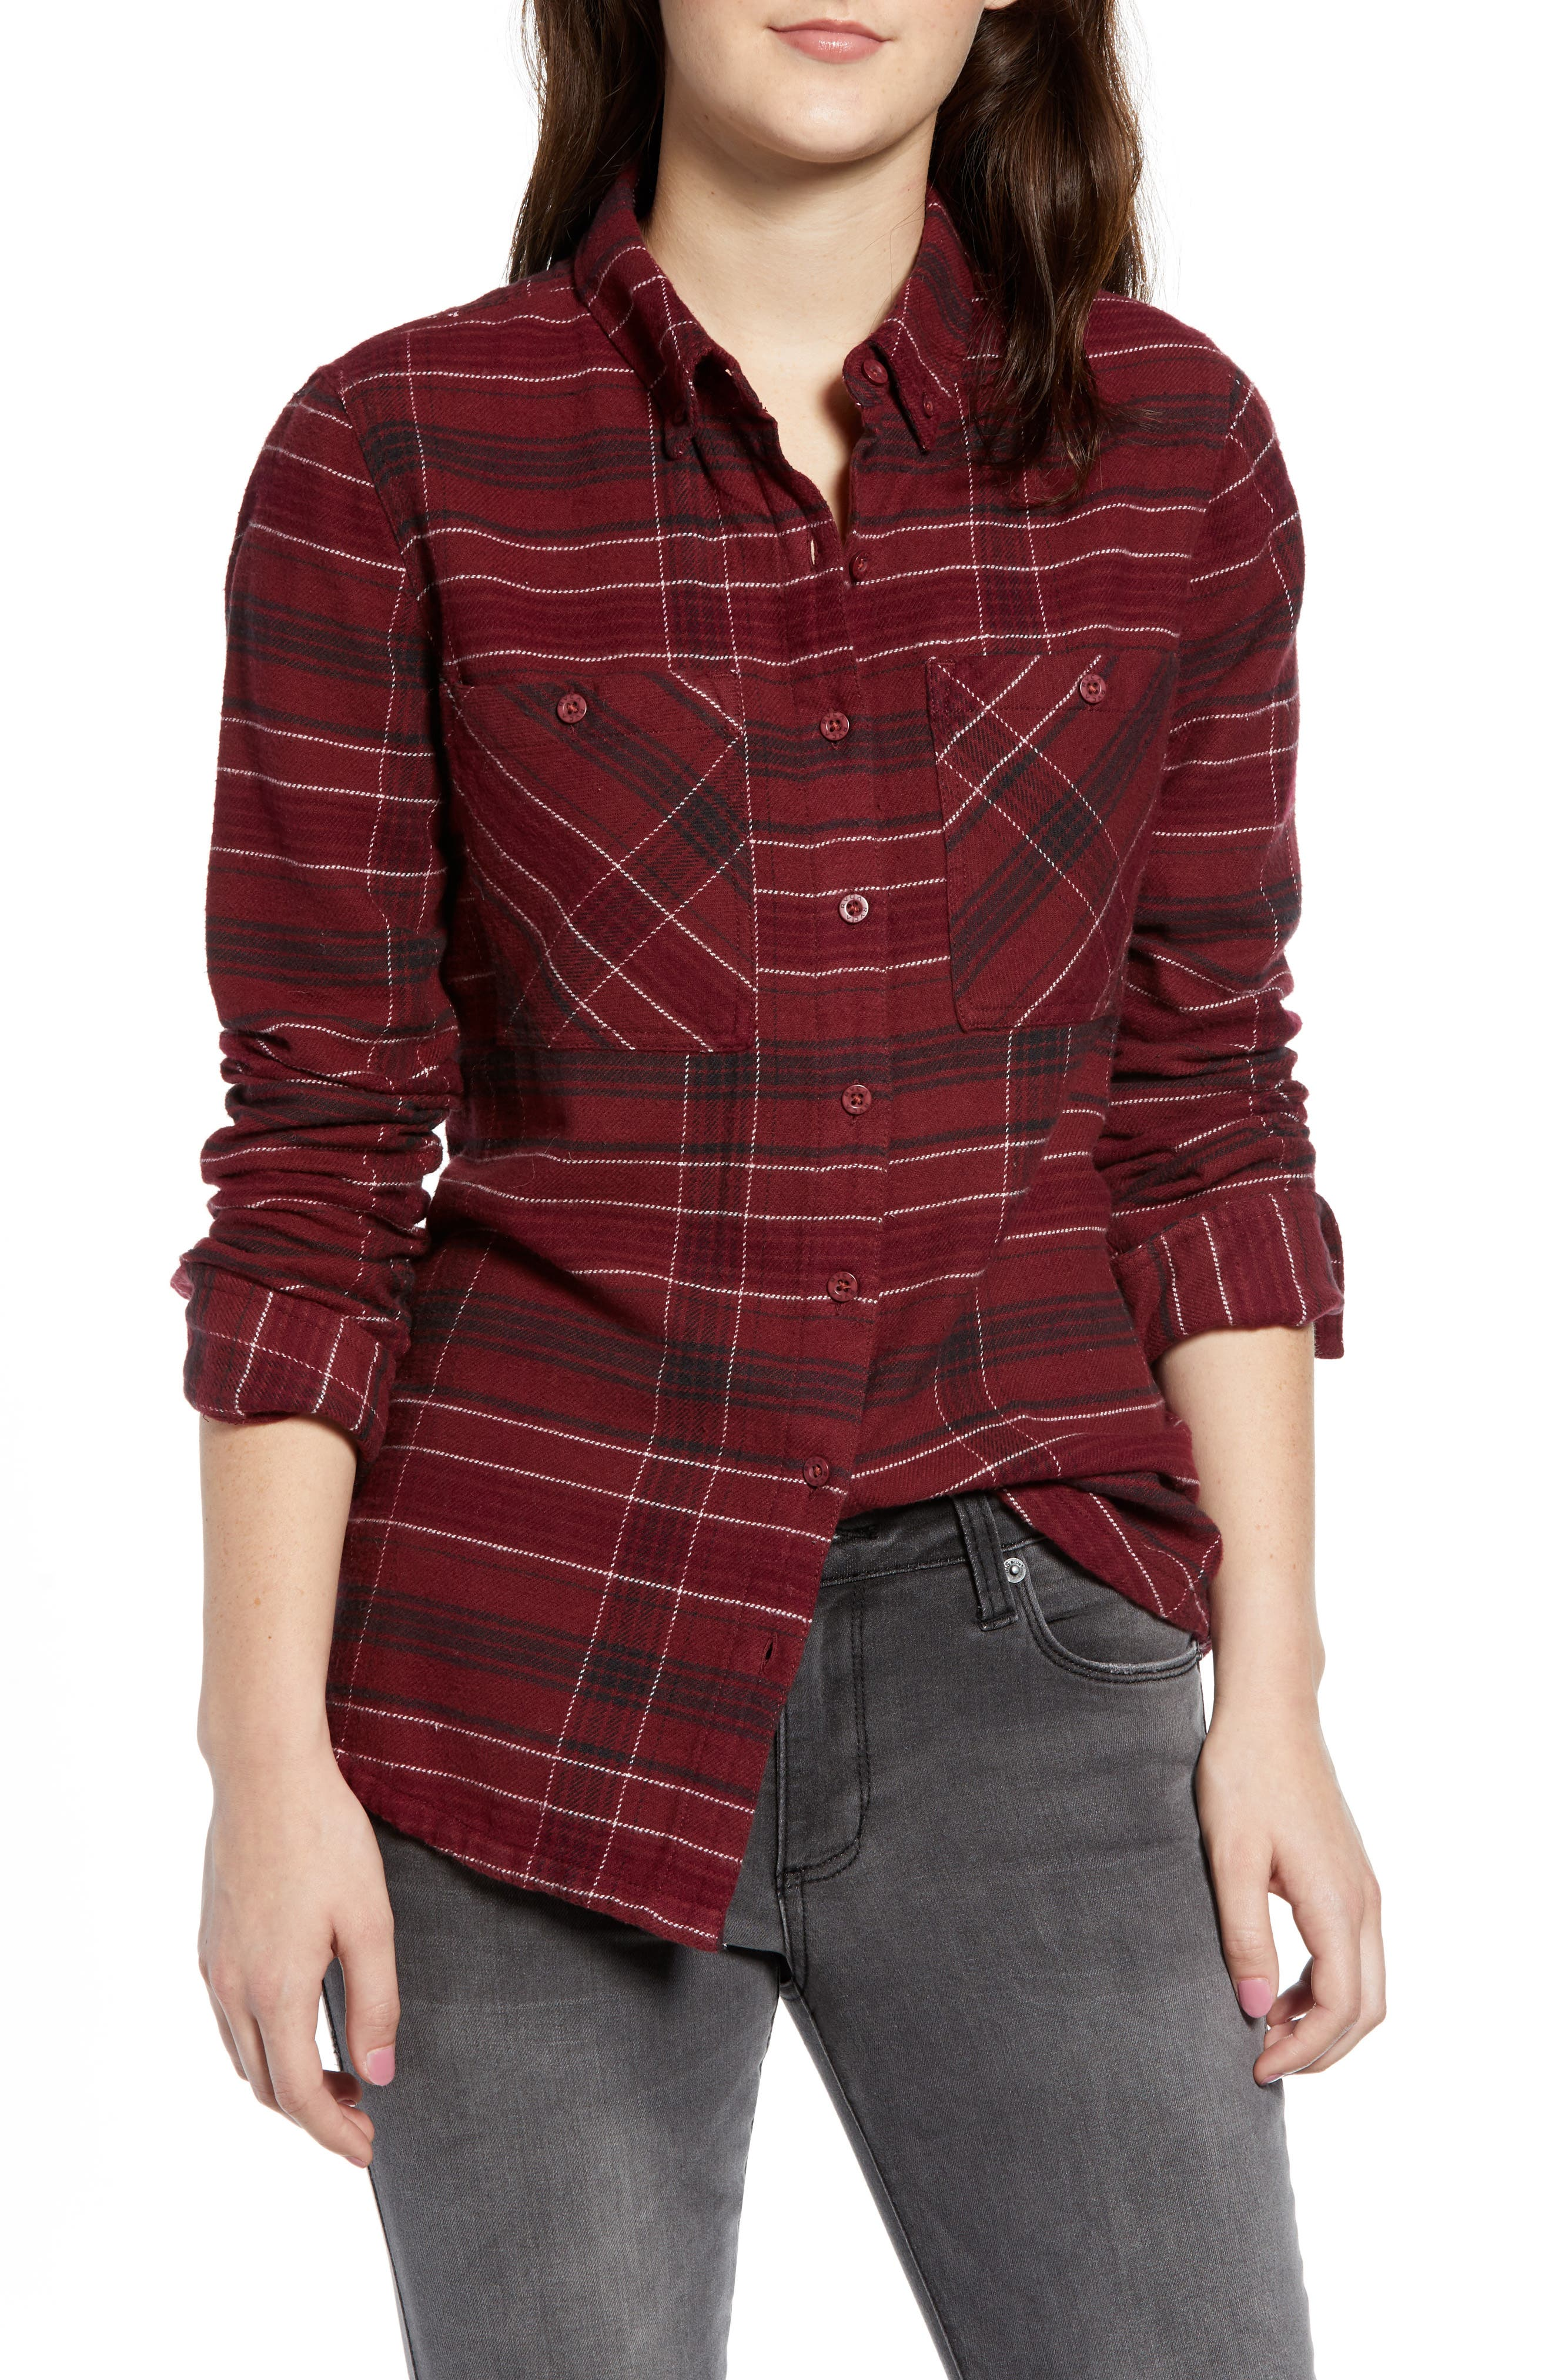 Rvca Roam Plaid Flannel Shirt, Red